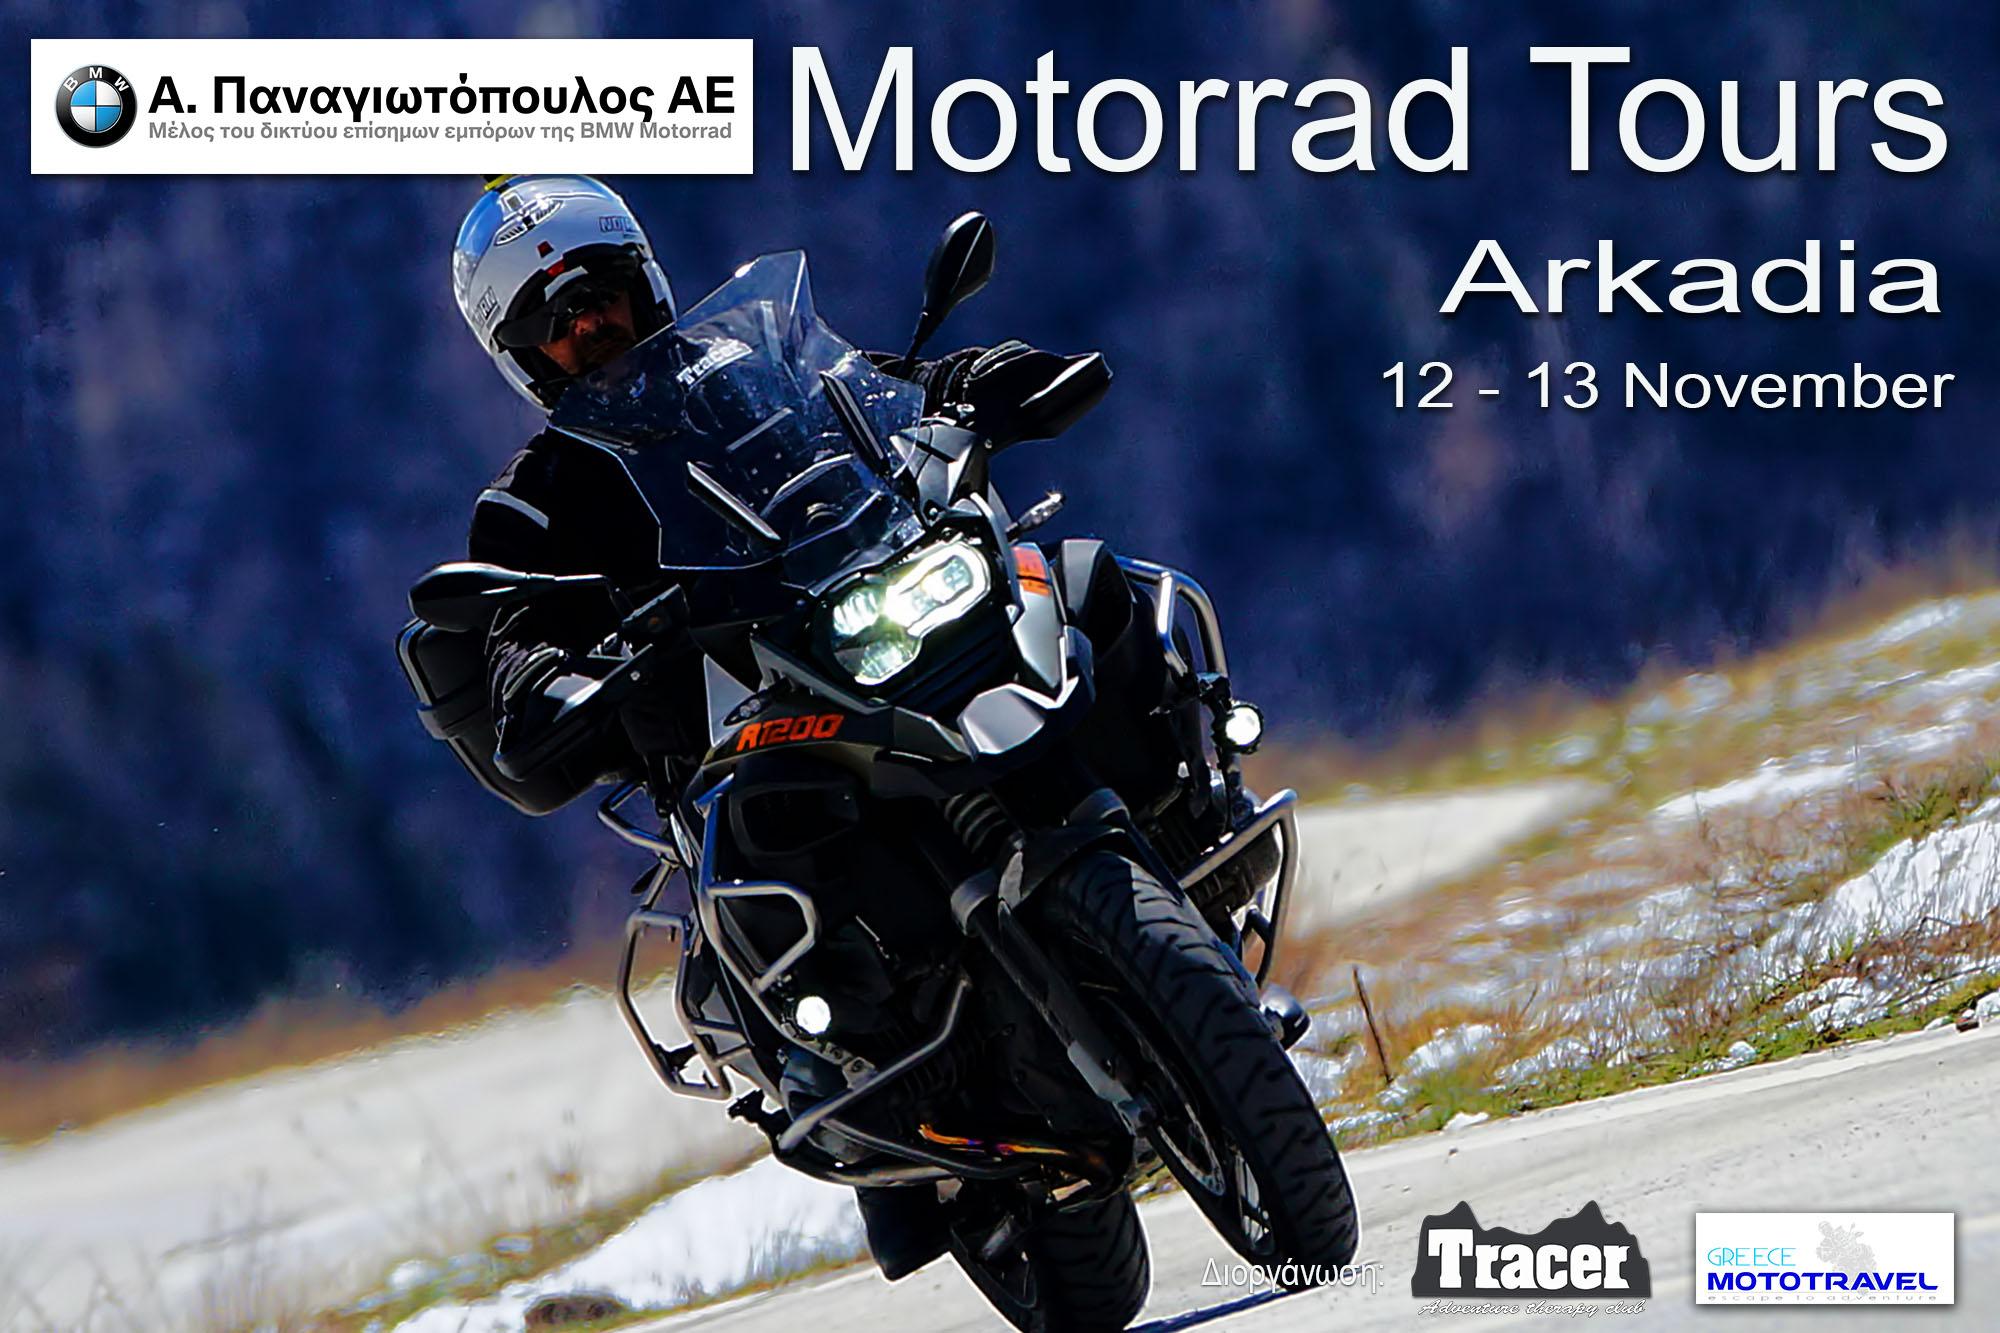 motorrad-tours